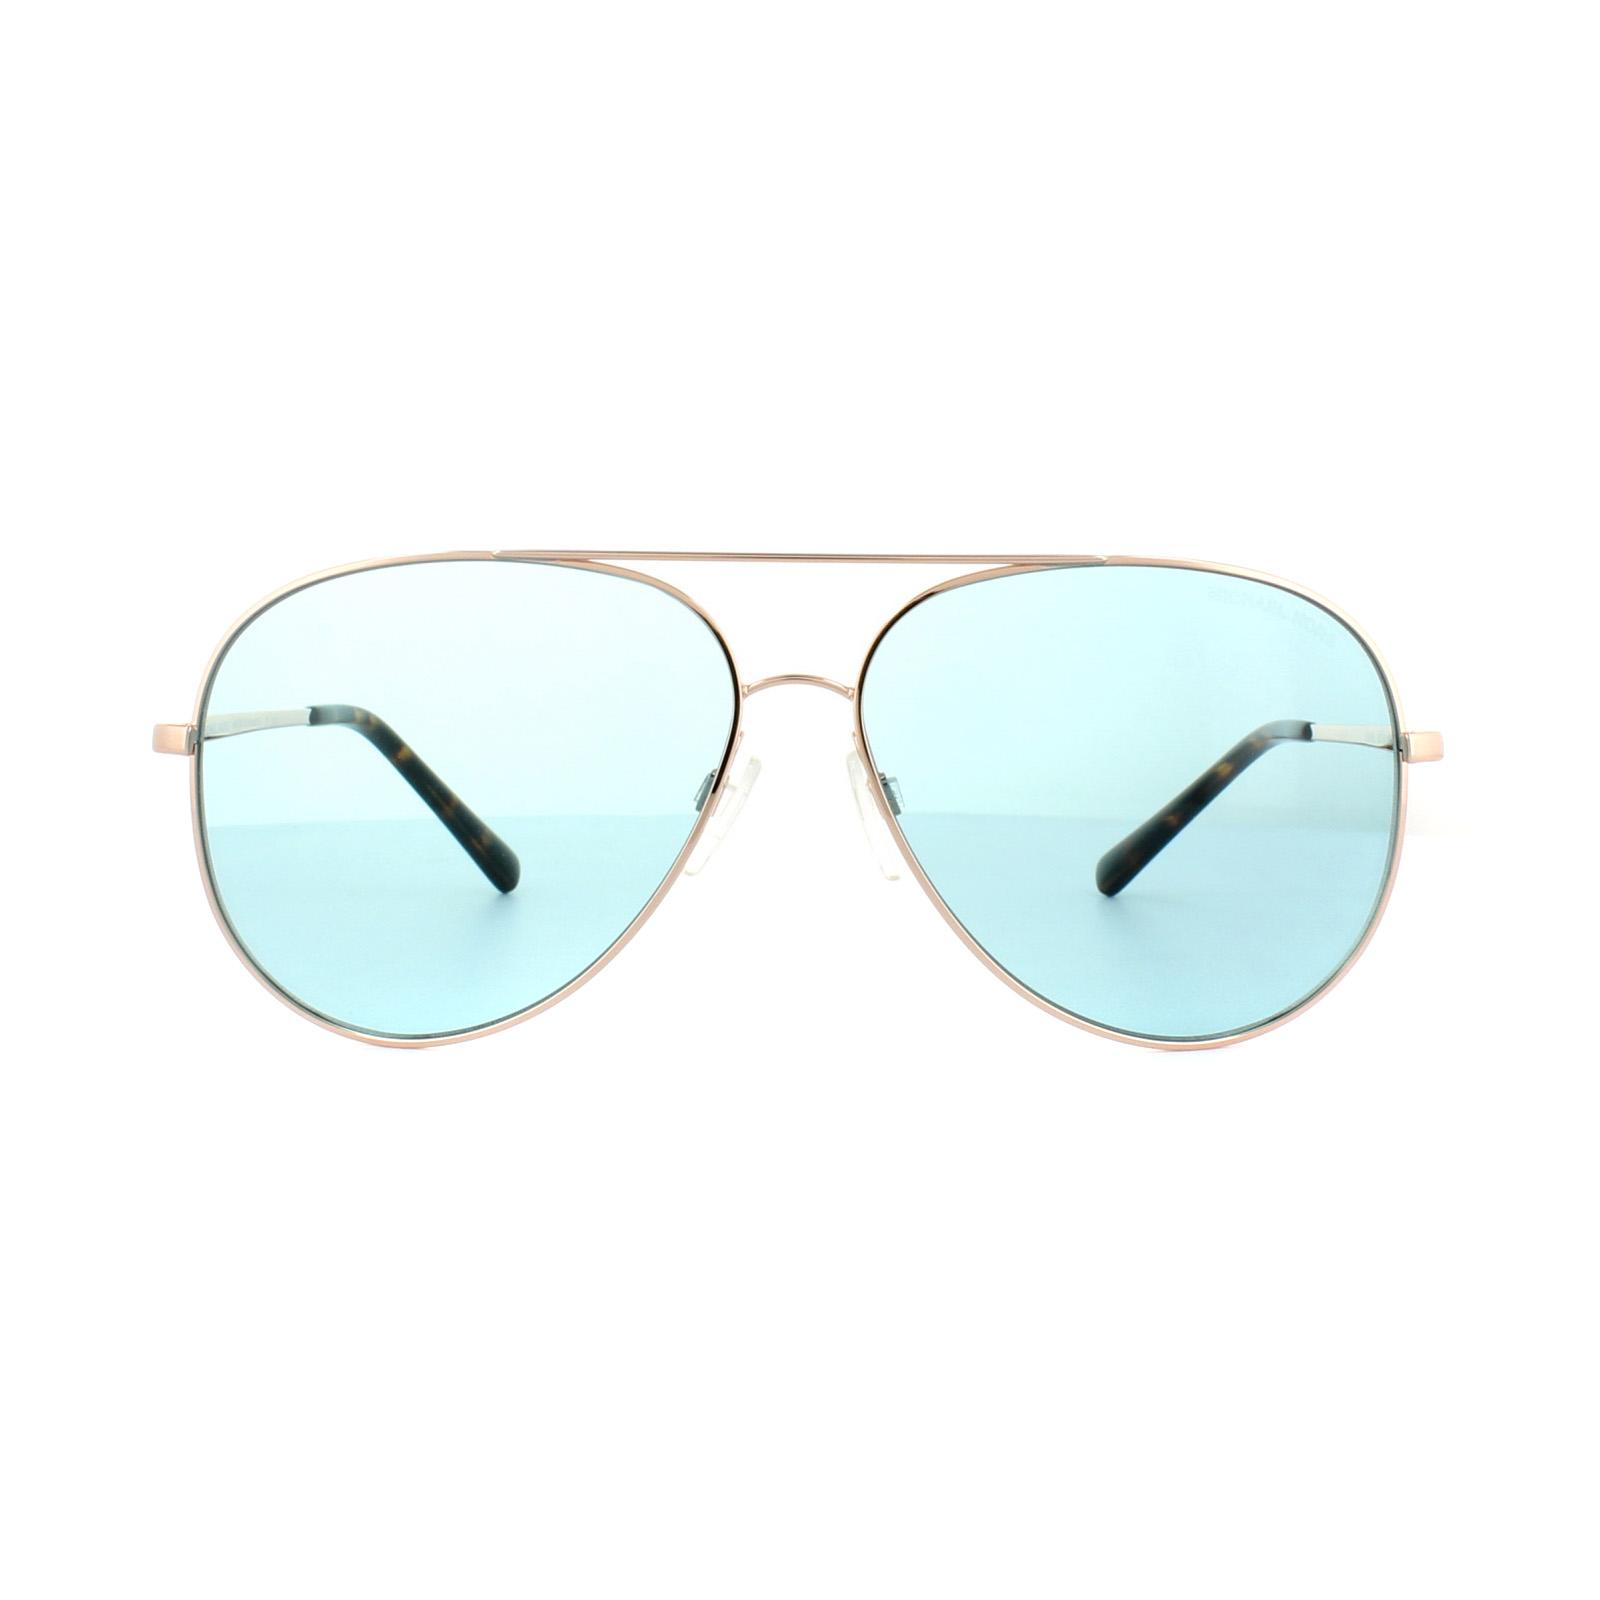 Sentinel Michael Kors Sunglasses Kendall 1 5016 1026 65 Rose Gold Teal e8b3045490f